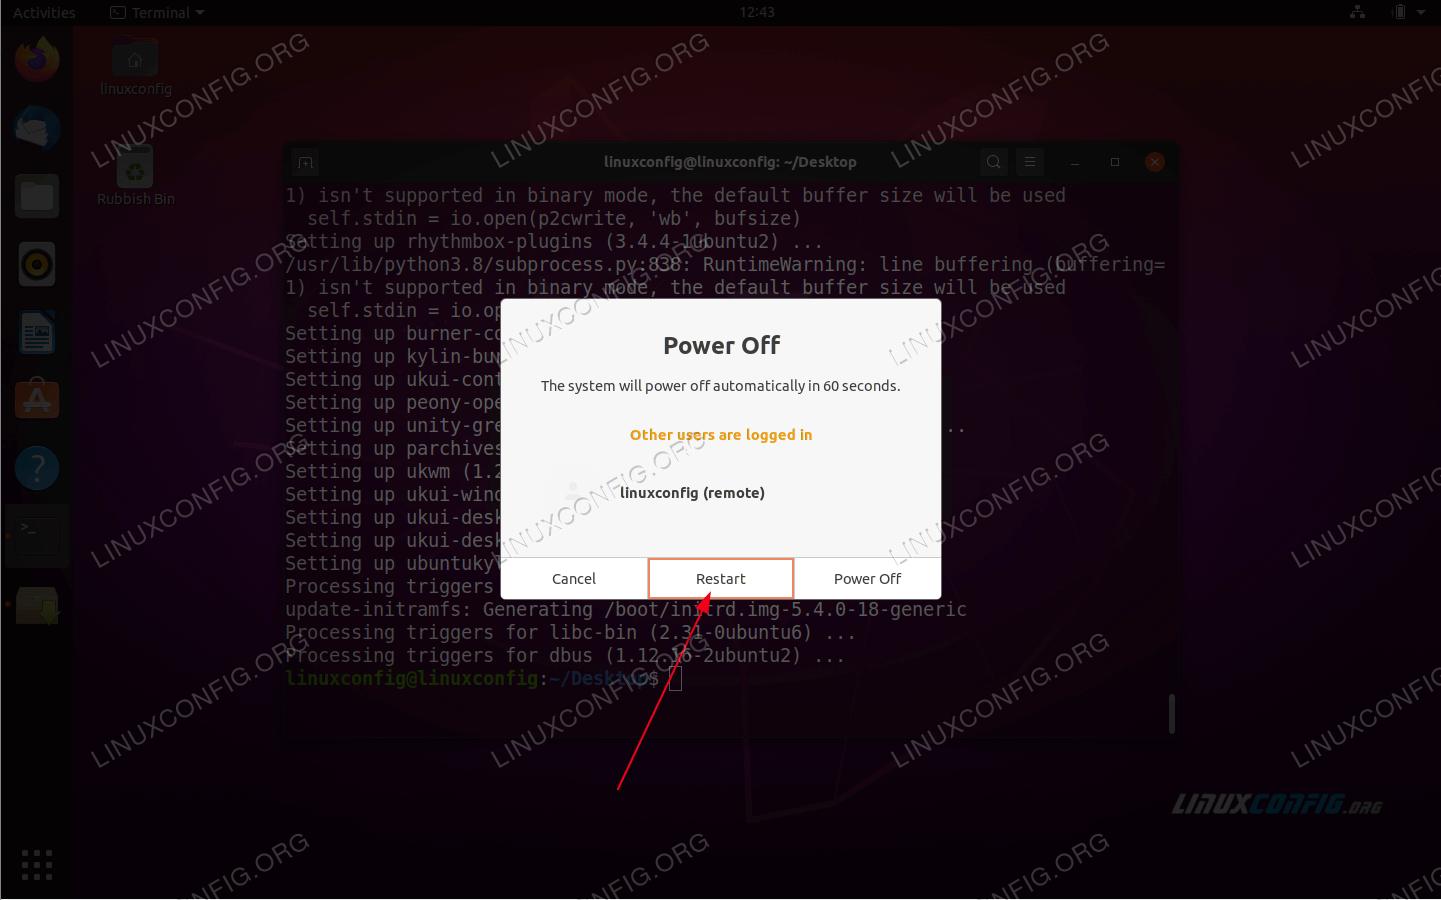 Once the Kylin Desktop Installation is complete, restart your system